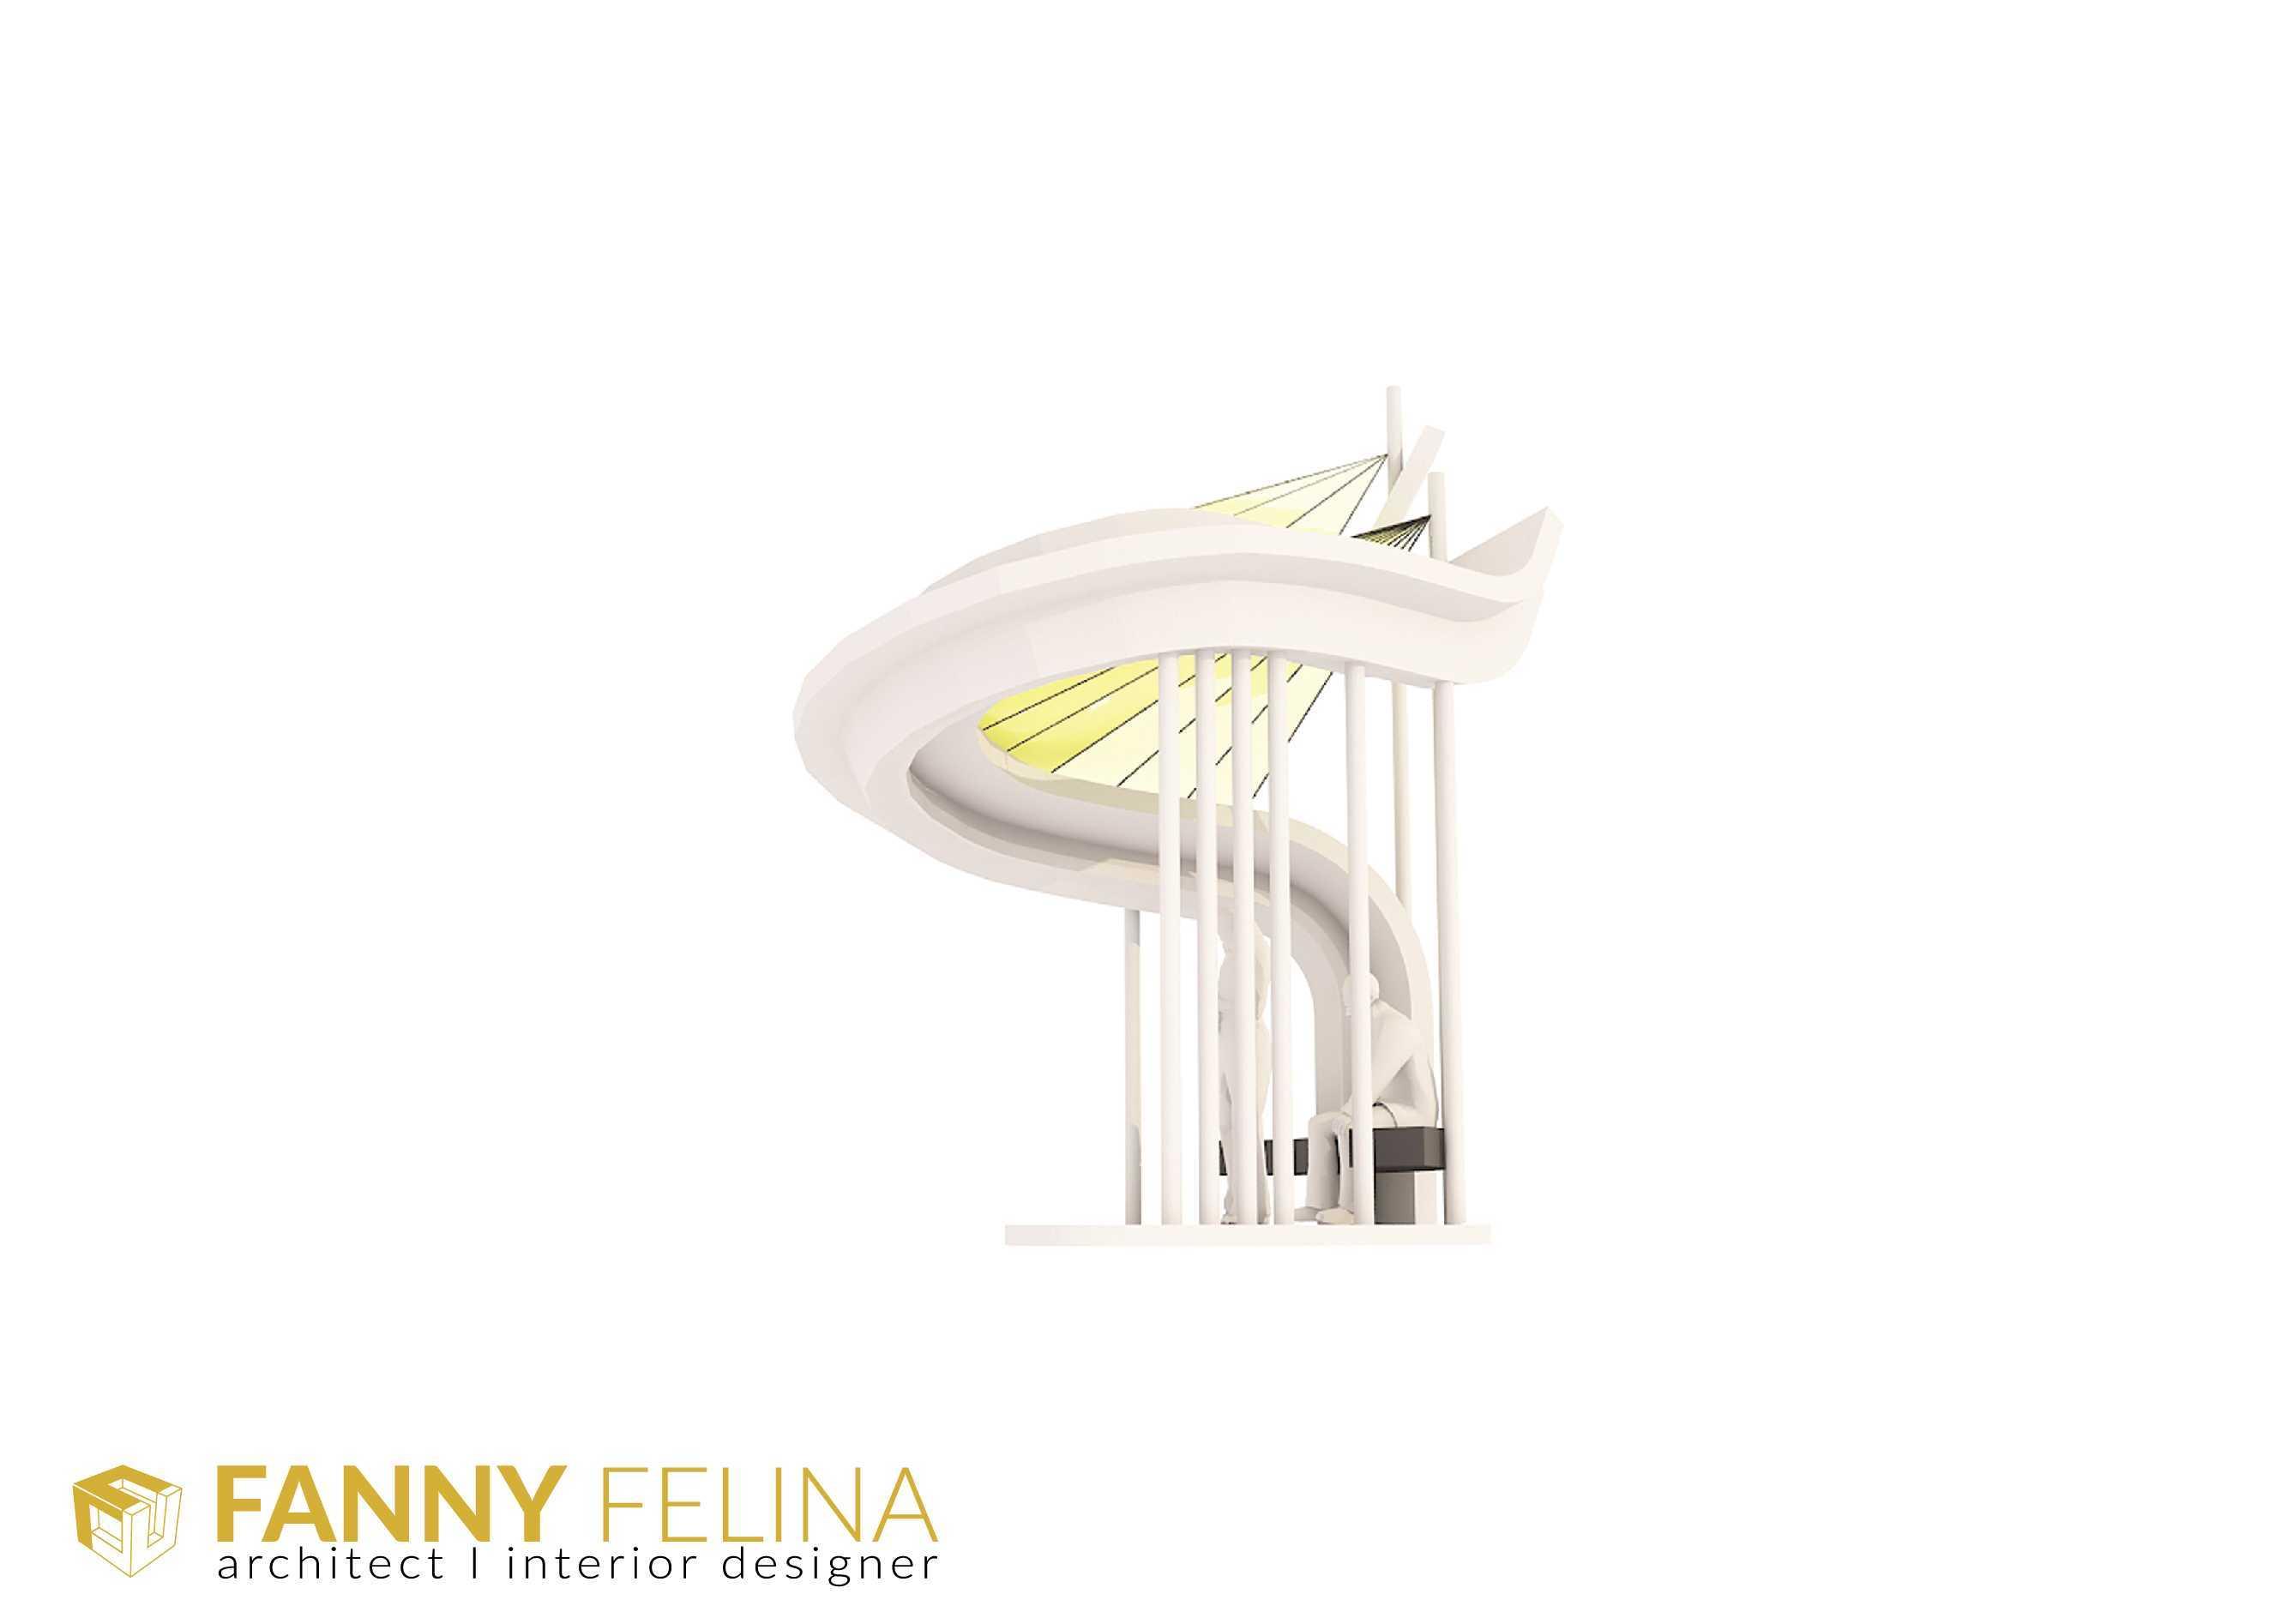 Fanny Felina Architecture & Interior Design P Shelter Surabaya, Surabaya City, East Java, Indonesia Surabaya, Surabaya City, East Java, Indonesia 04 Kontemporer,modern  35318